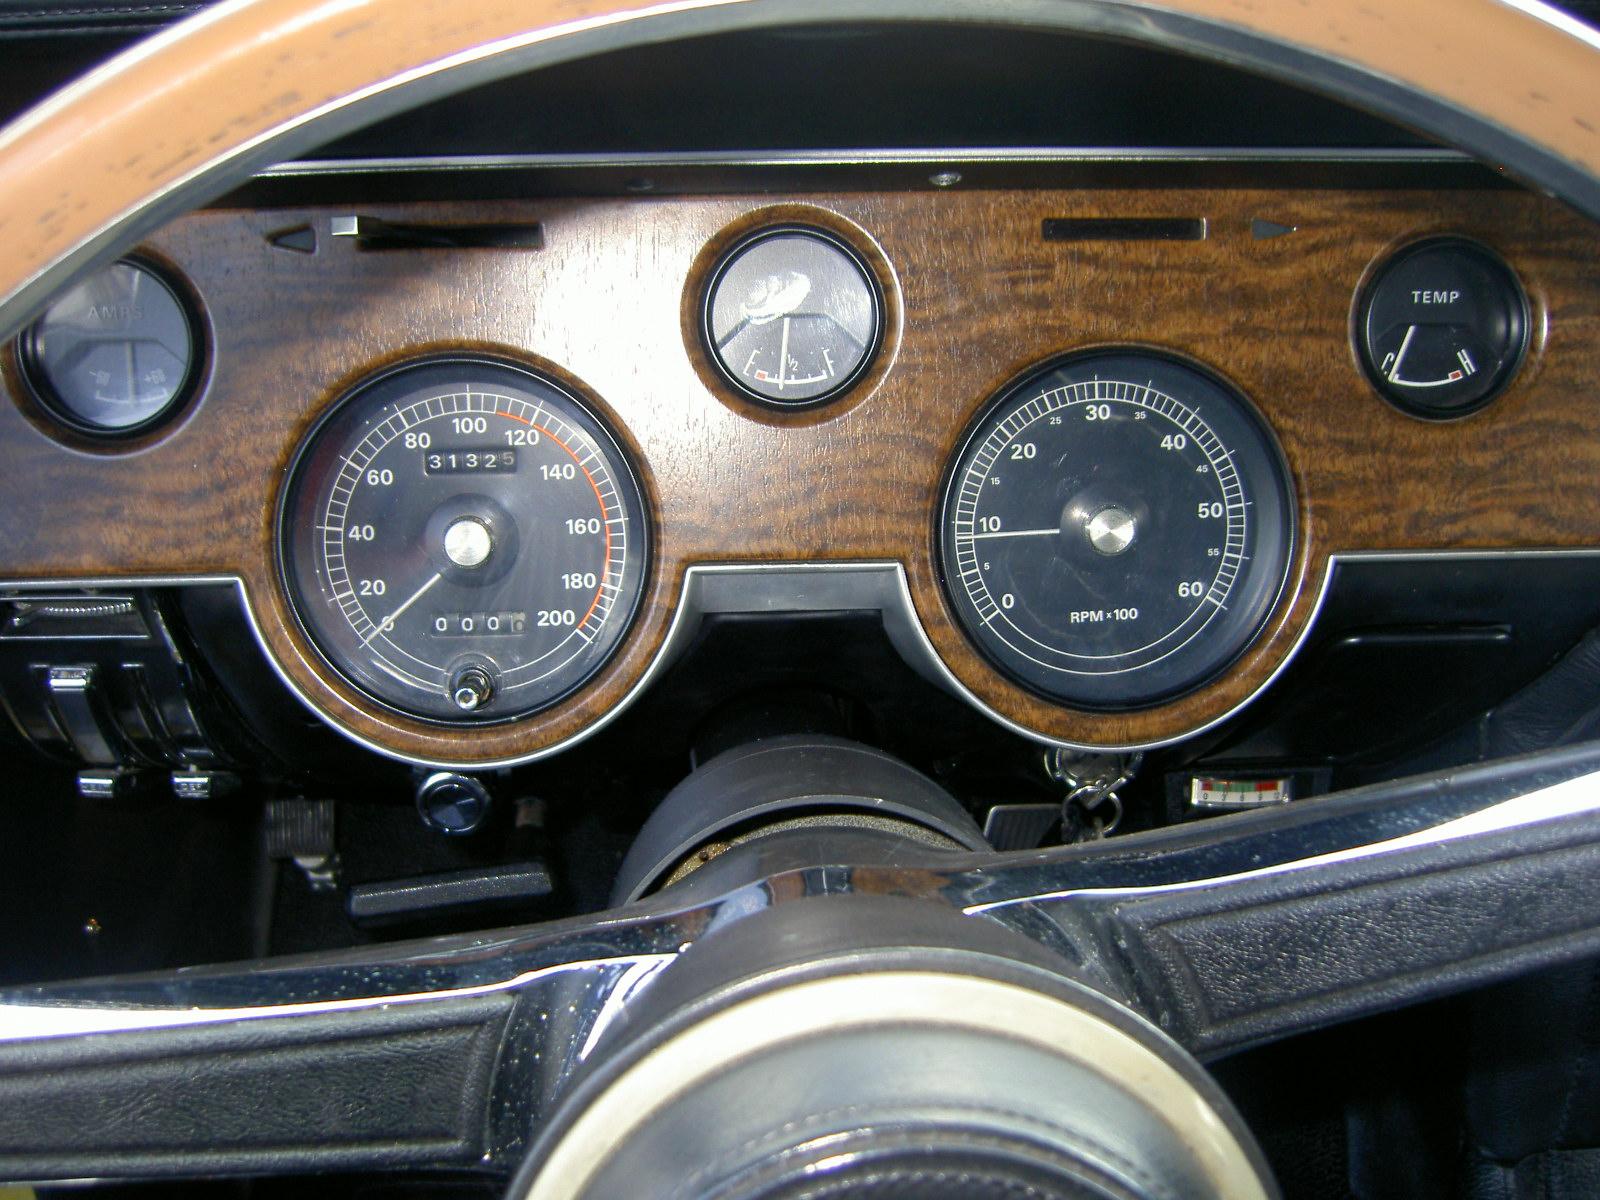 1968 Mustang Tach Wiring Rocketman S Classic Cougar Innovations